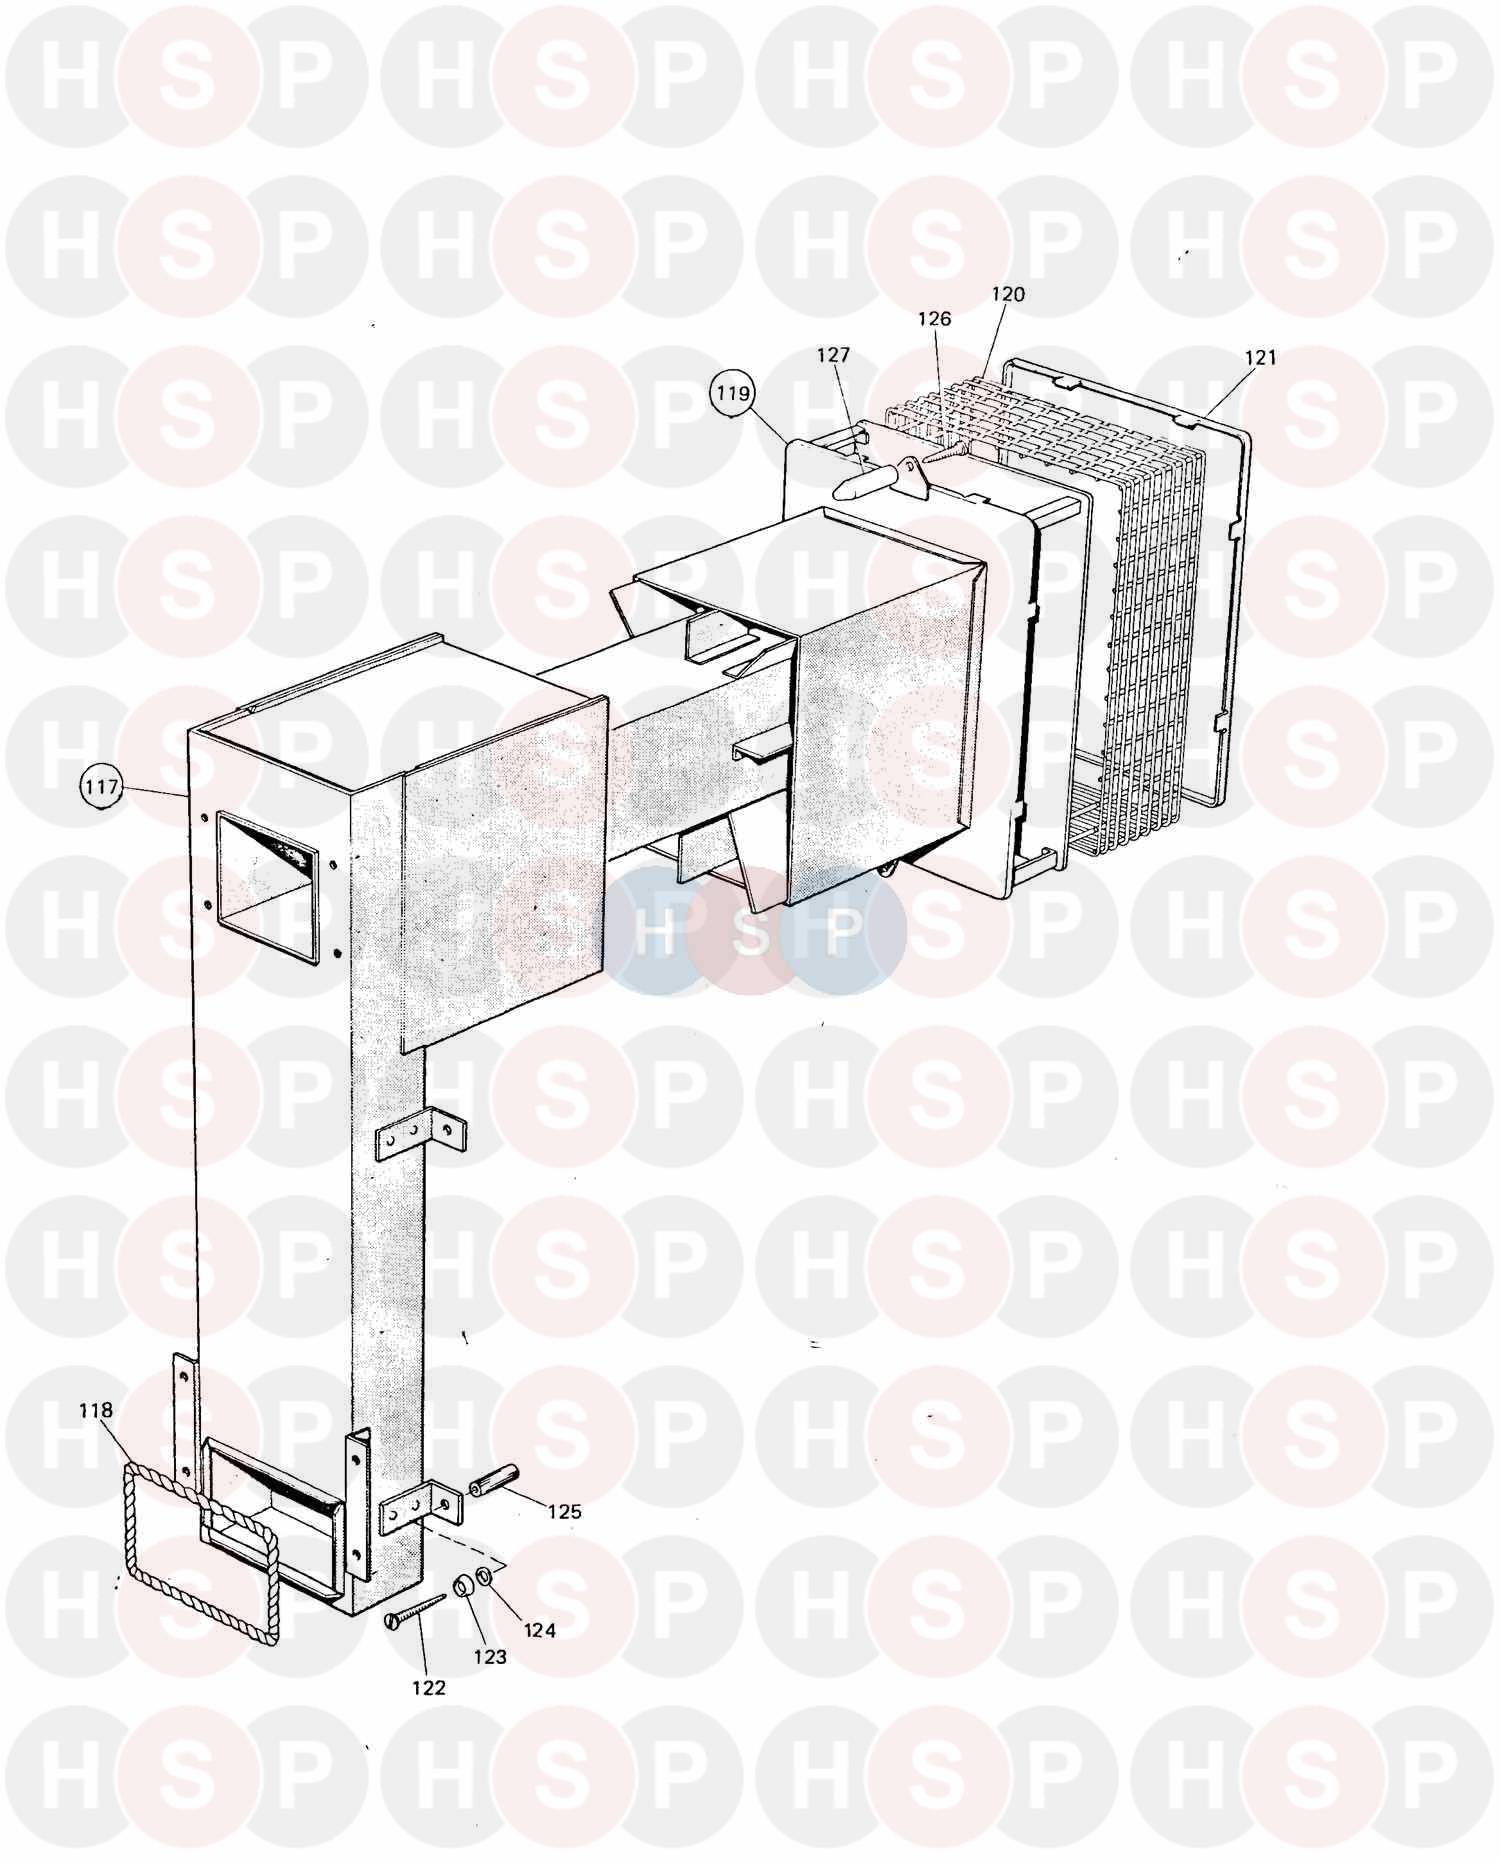 potterton flamingo rs 50 wall mounted appliance diagram  air duct  u0026 terminal